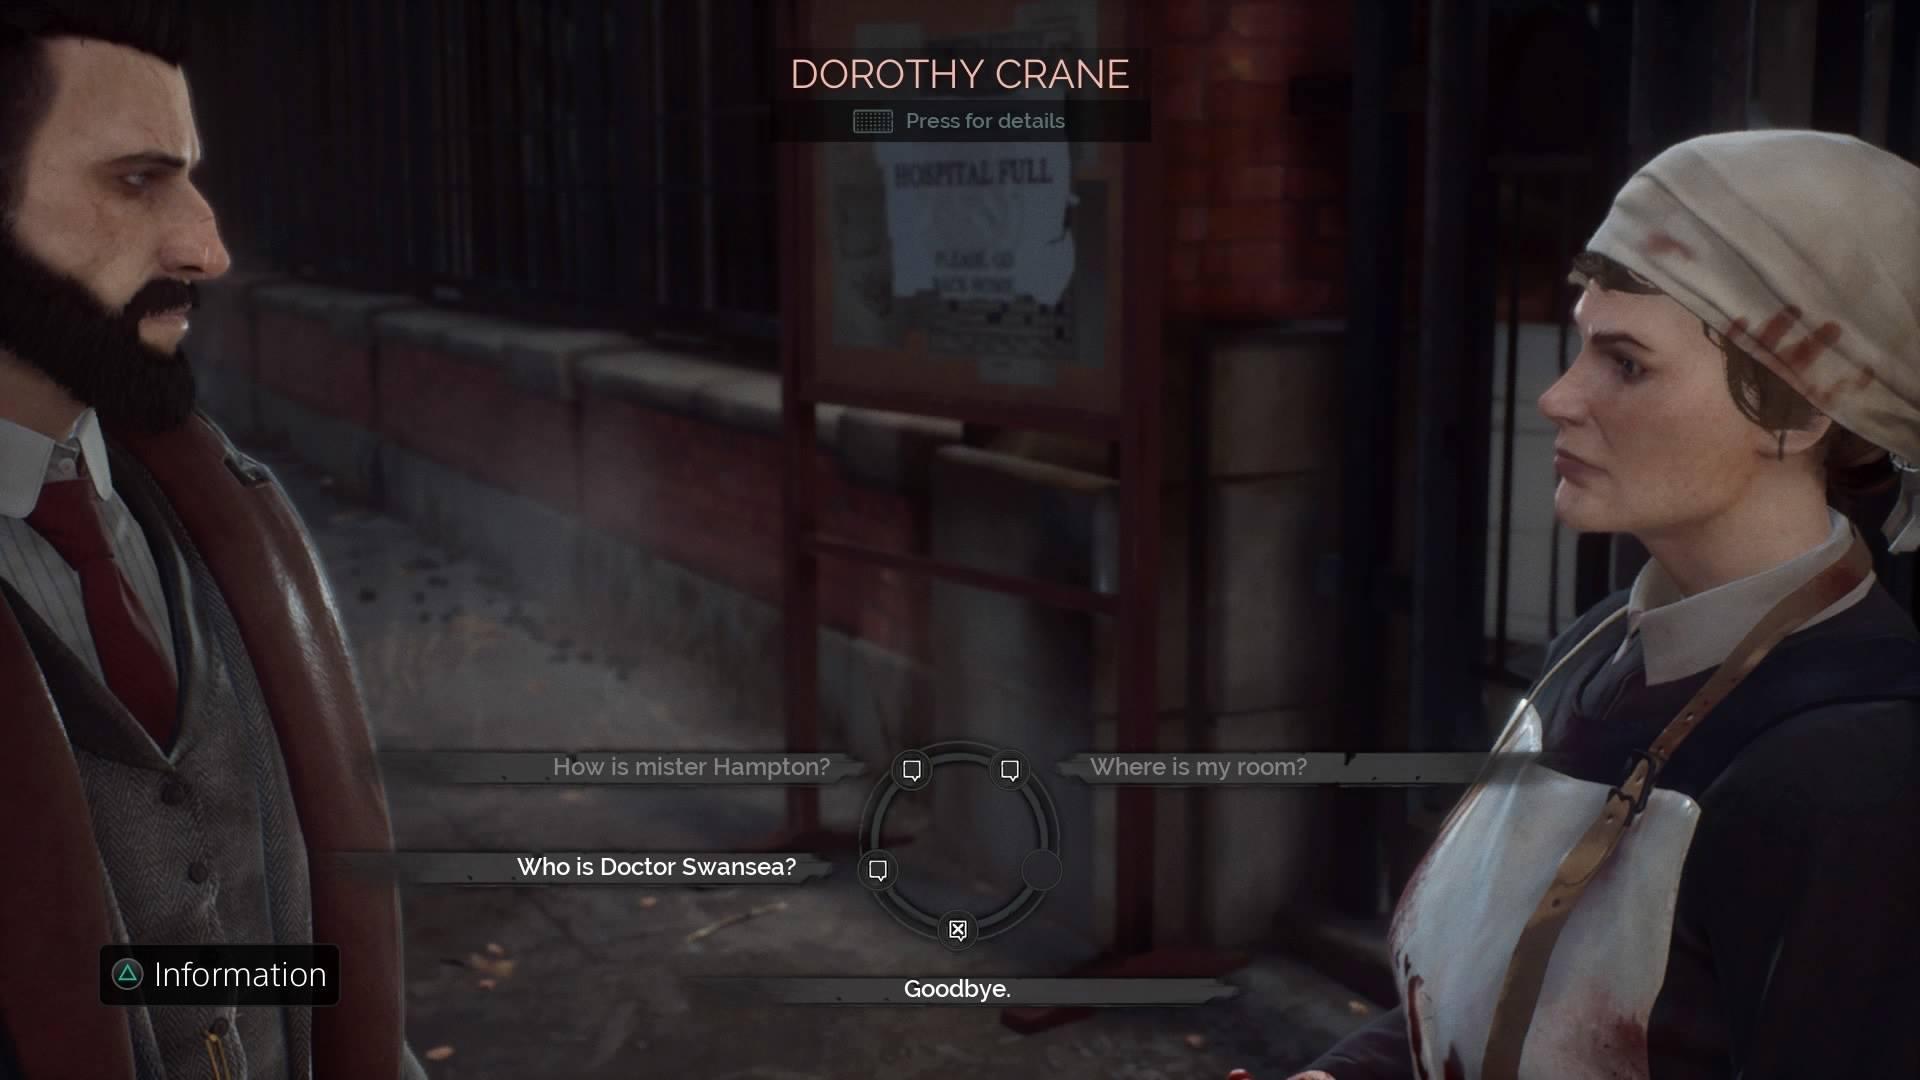 Vampyr ADG AntDaGamer Exclusive Screenshots courtesy of DONTNOD (4)